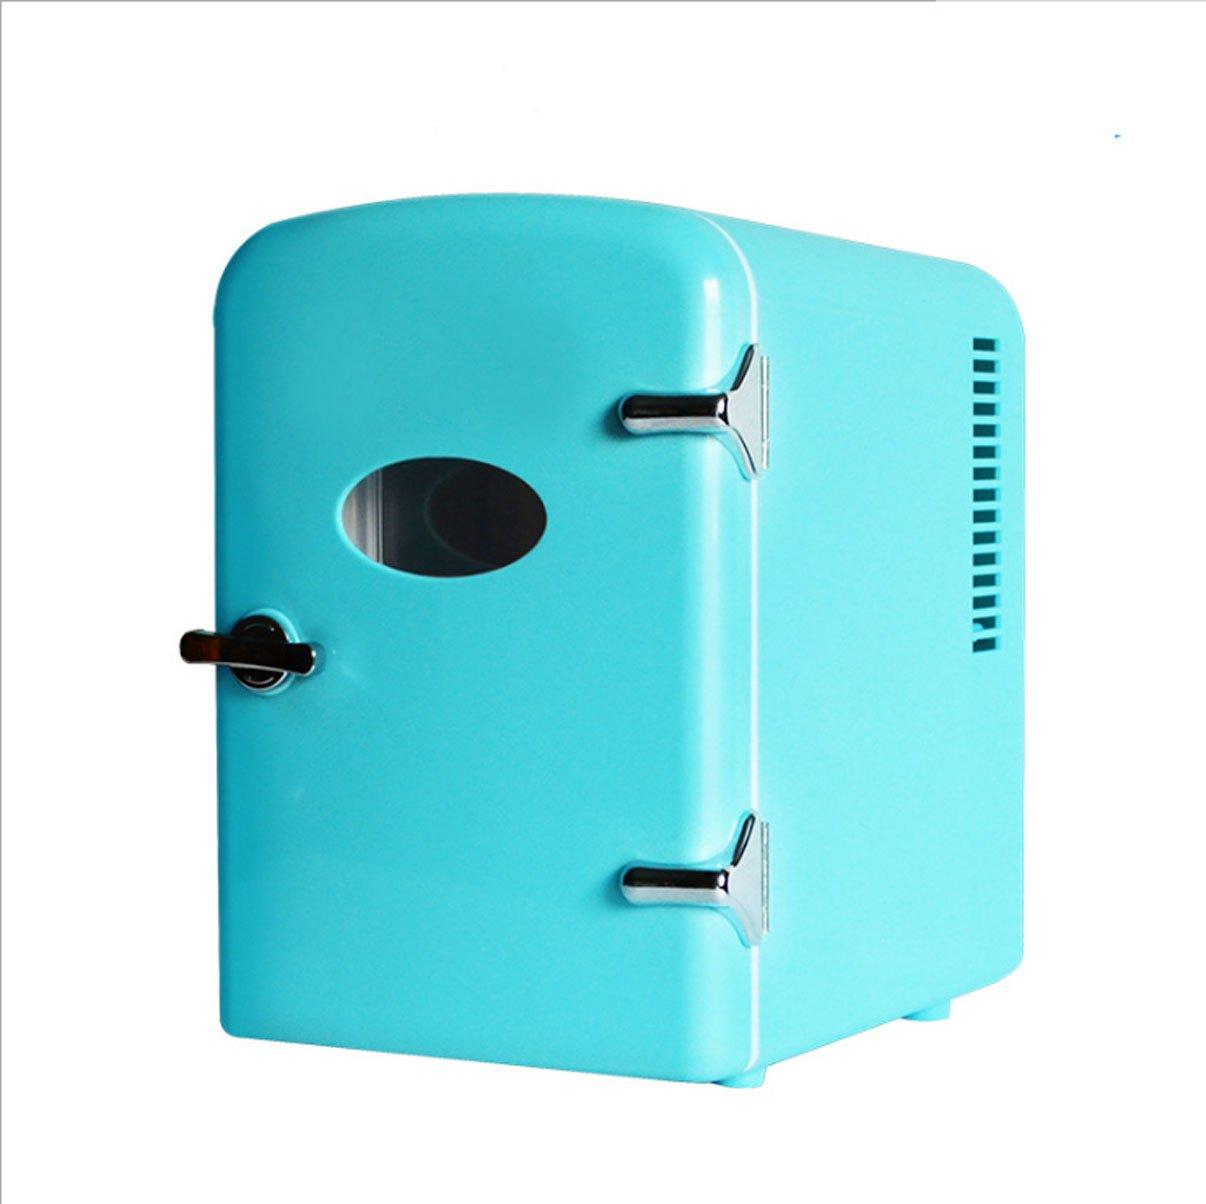 Color : Black tragbare Mini-K/ühlschrank Medikamentenlager Kosmetik-K/ühlschrank Thermostat T-Day Car K/ühlschr/änke 5L Auto K/ühlschrank AC und DC Hotspot-System